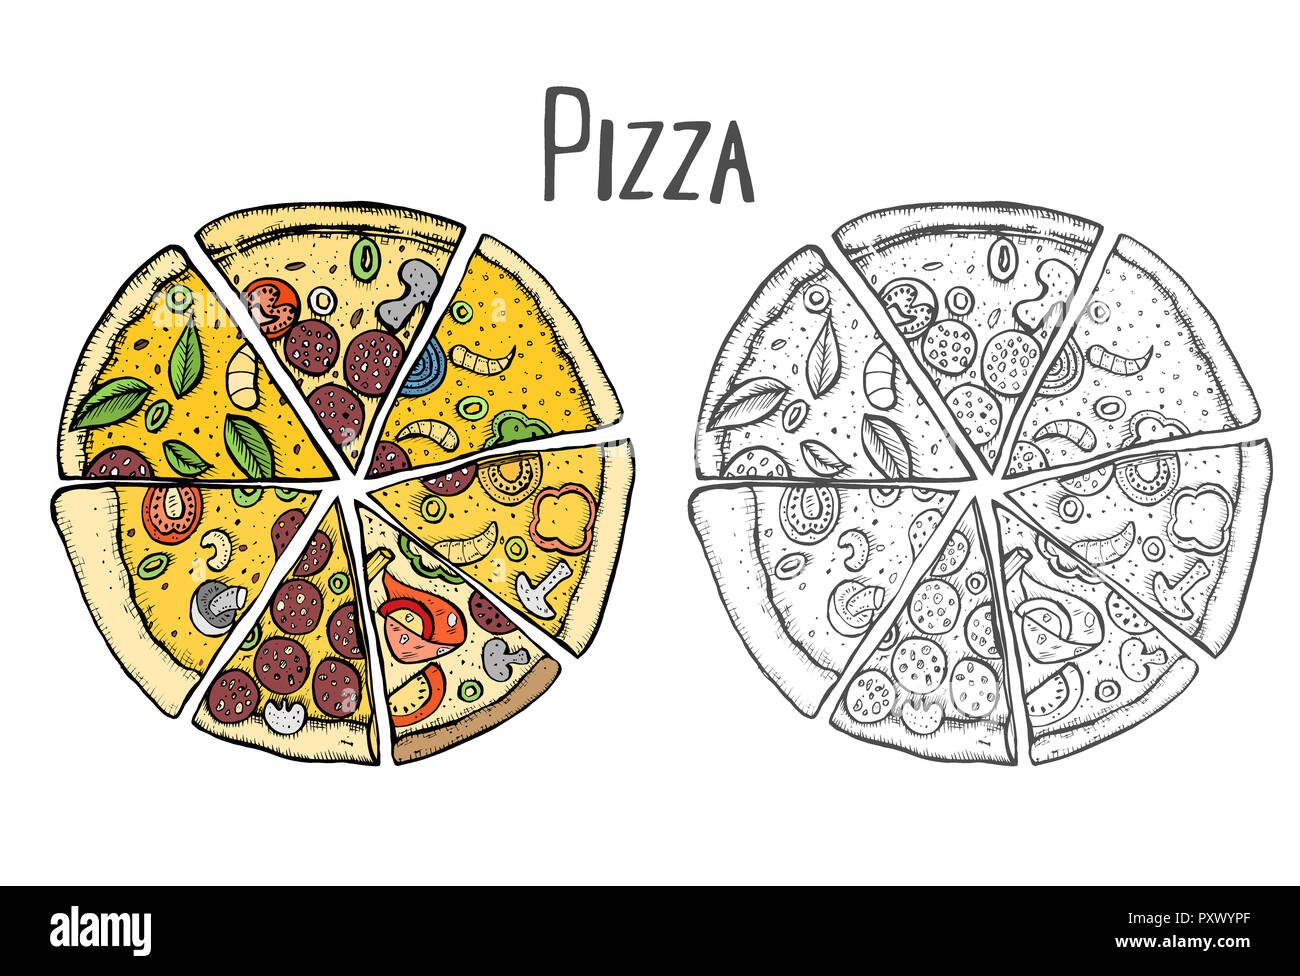 colored italian pizza hand drawn illustration pizza slices in a